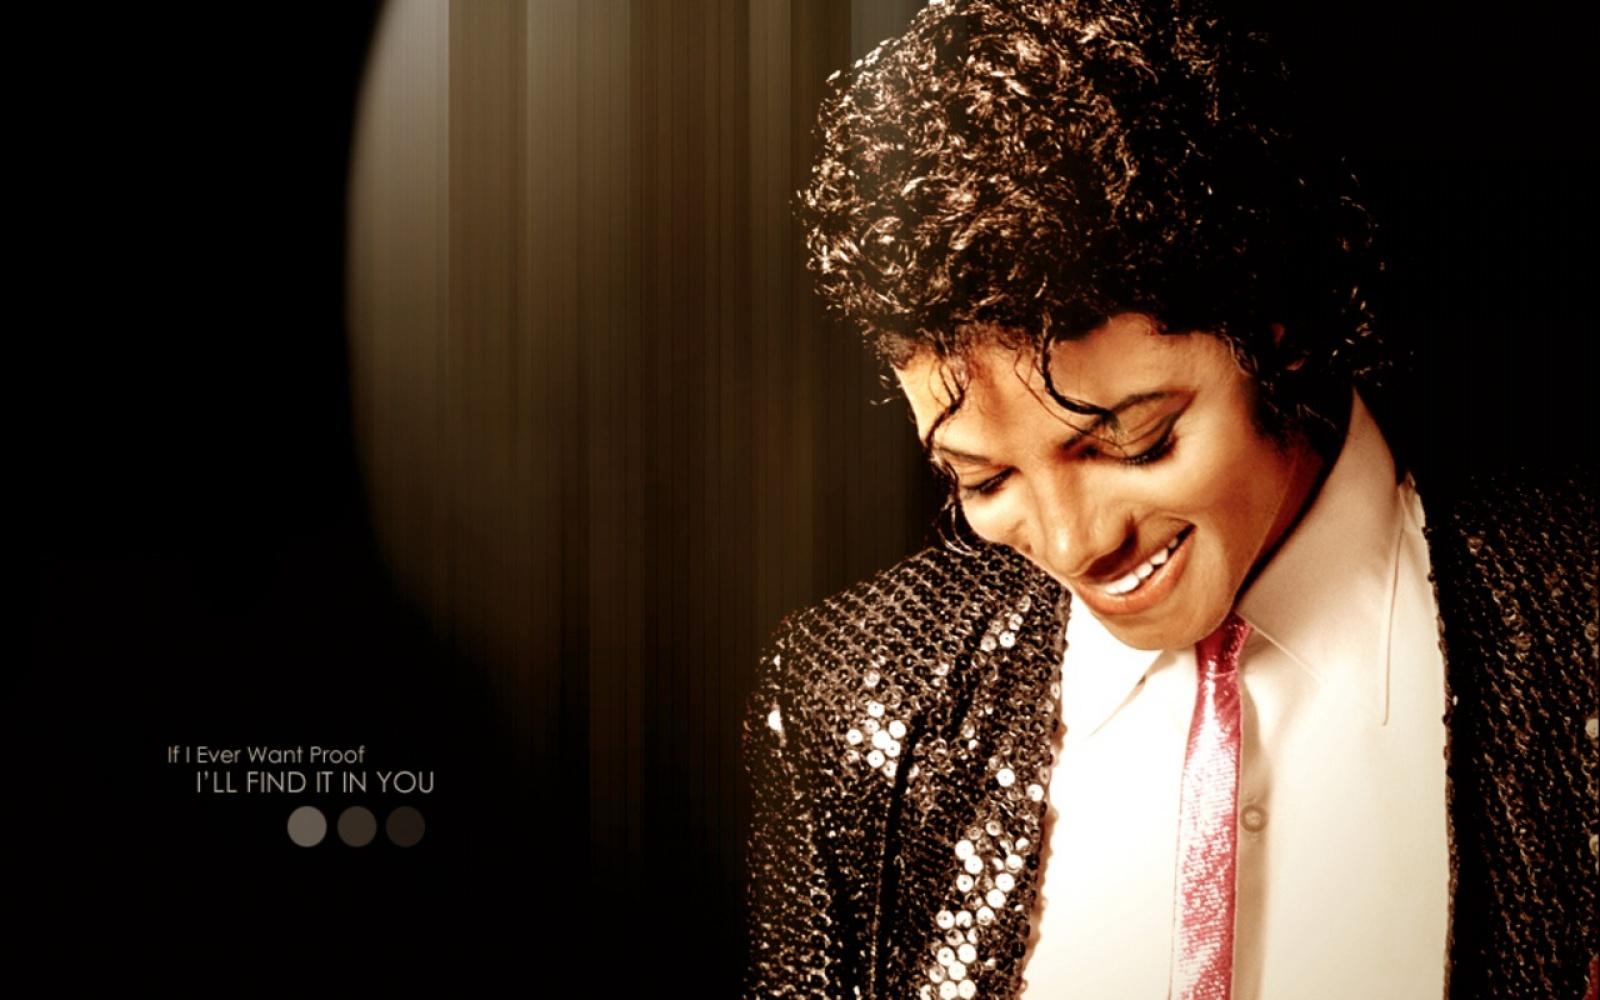 http://1.bp.blogspot.com/-JlS8Te8qcOA/TtaLY1-6rzI/AAAAAAAABQs/NQ_bRKoXF9g/s1600/ws_Young_Michael_Jackson_1600x1200.jpg